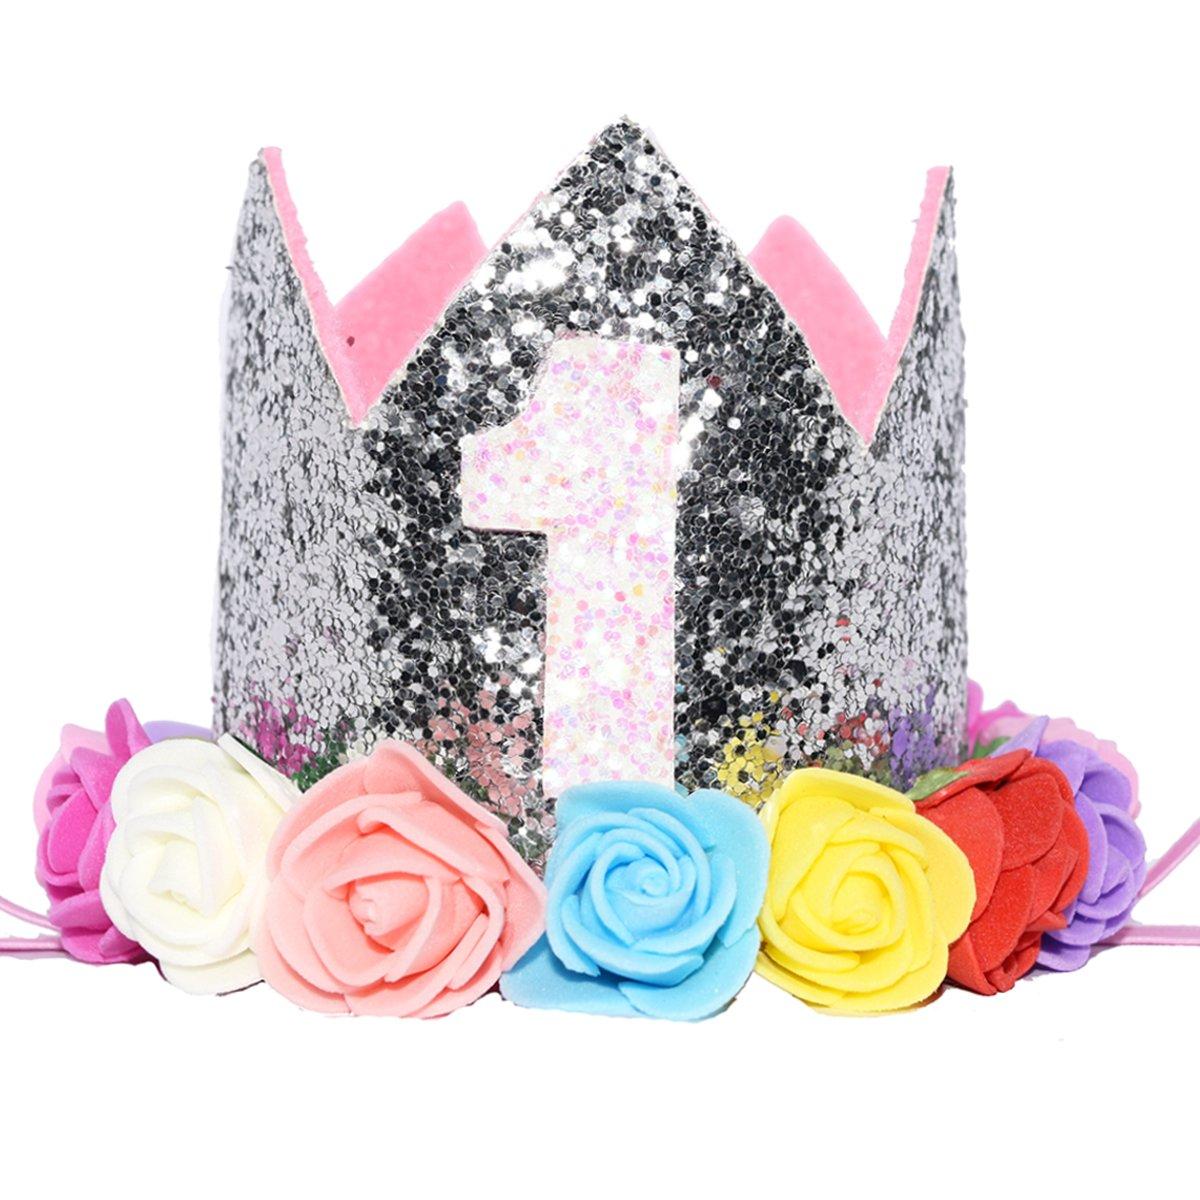 Glitter 1/2 Birthday Princess Flower Crown Tiara Headband Cake Smash Photo Prop